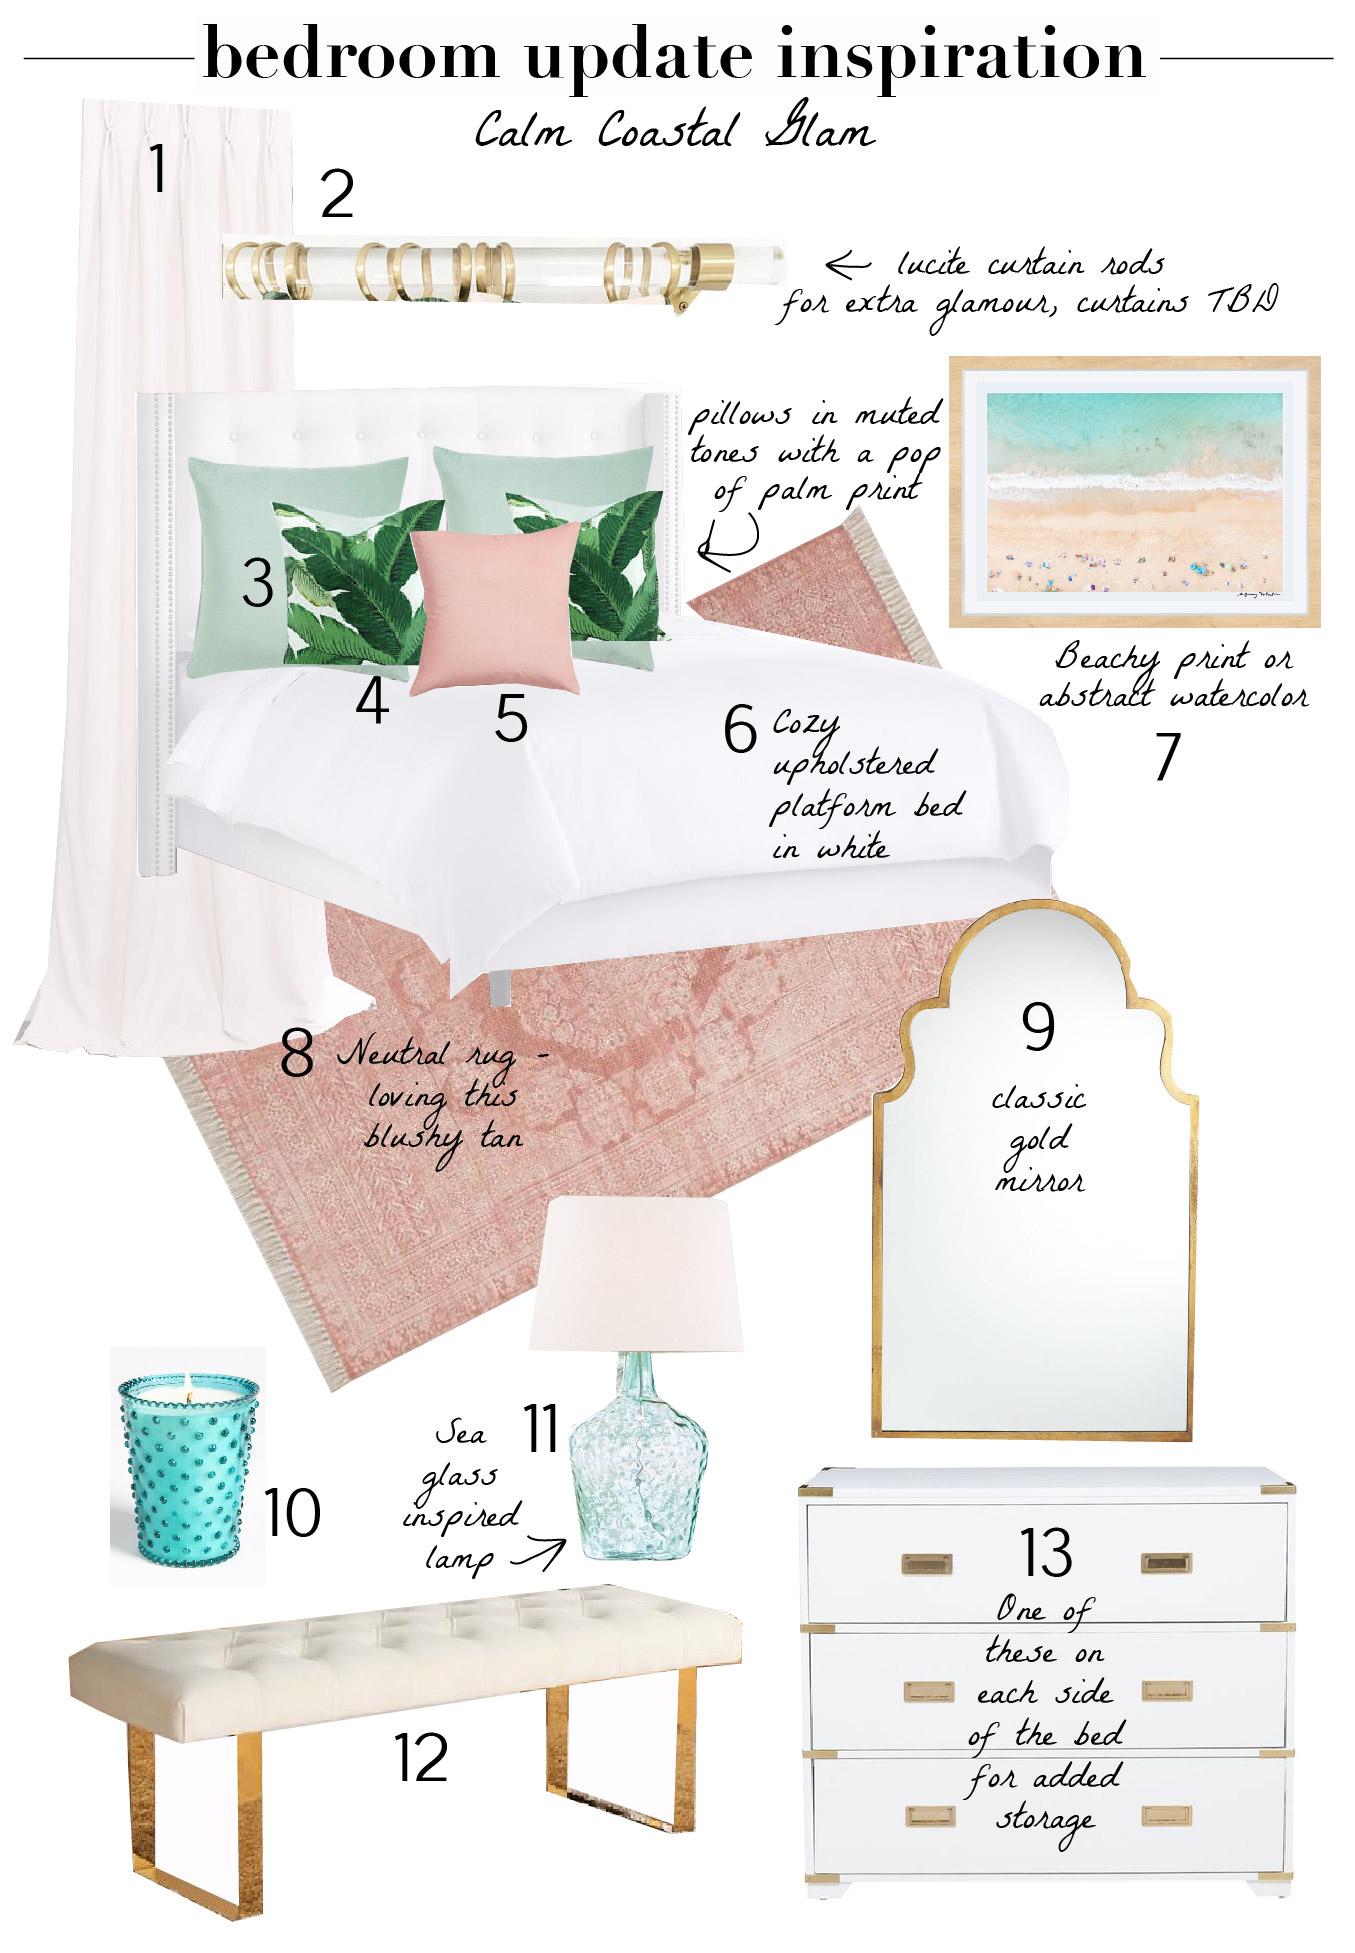 Shopping-Bedroom Update Inspiration Calm Coastal Glam